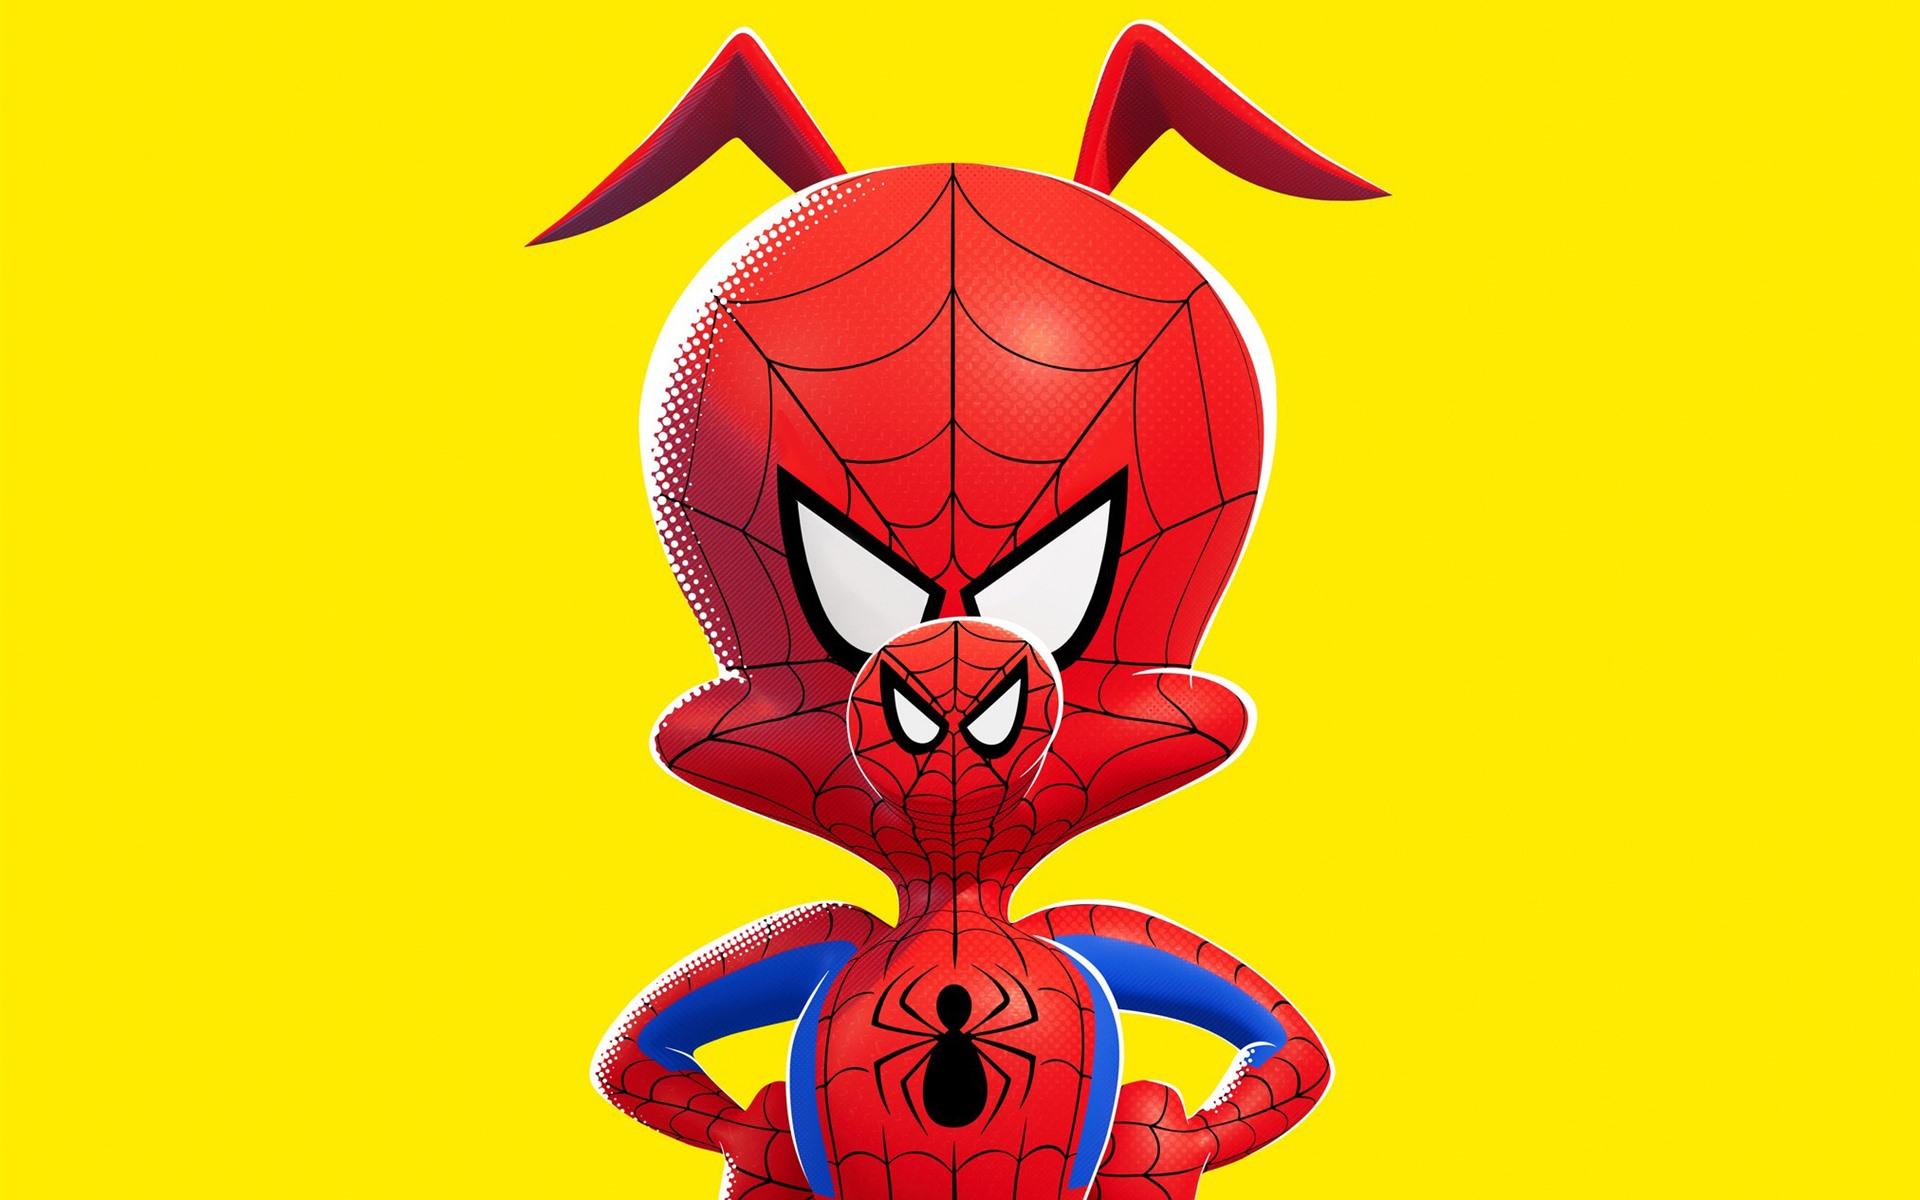 Wallpaper Spider Man Into The Spider Verse 2018 1920x1200 Hd